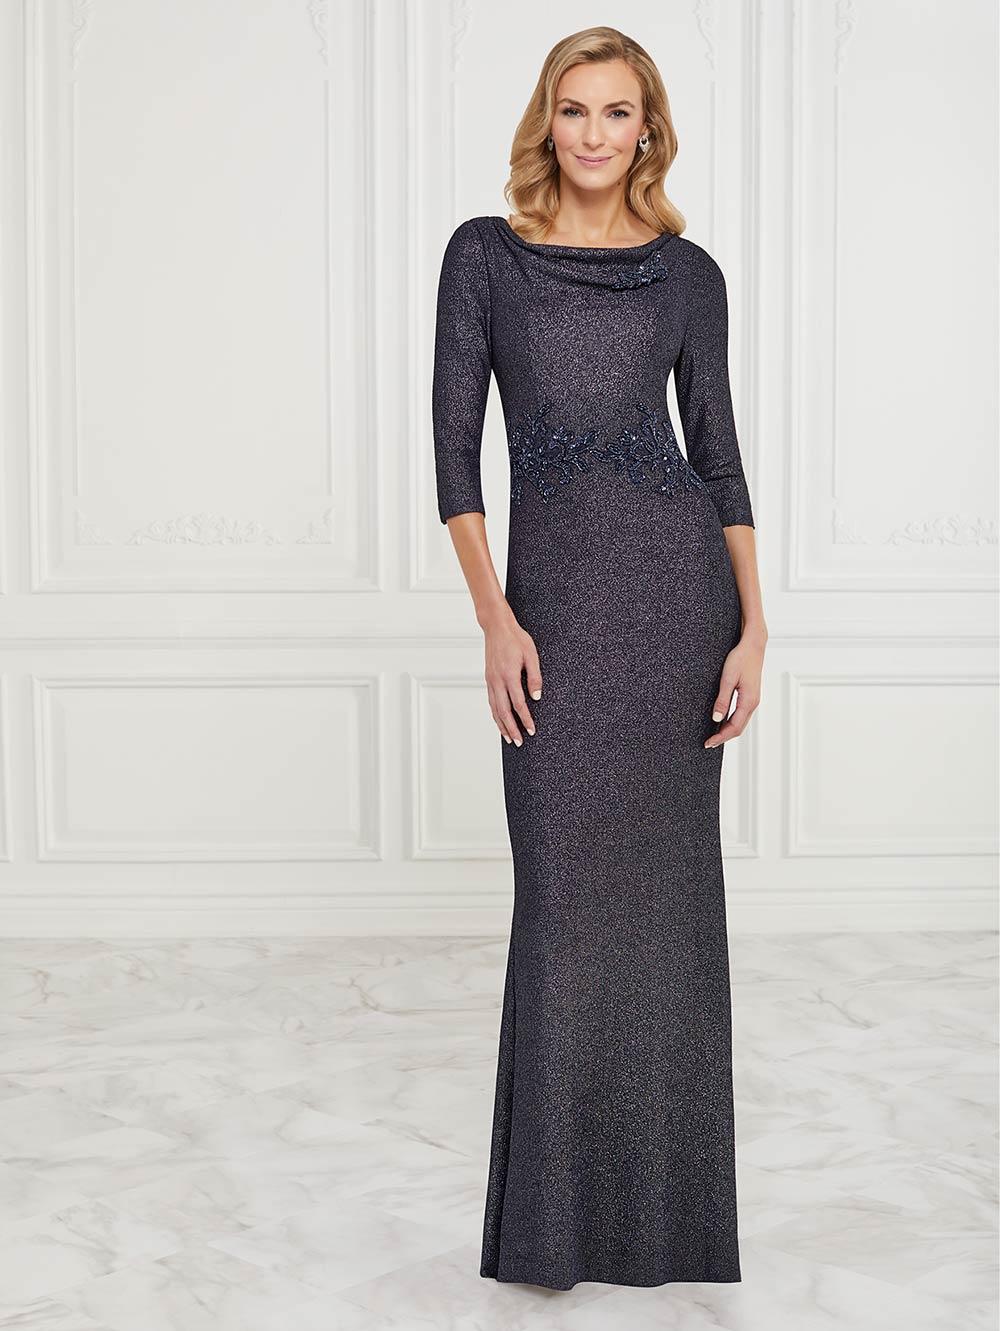 special-occasion-dresses-jacquelin-bridals-canada-27695